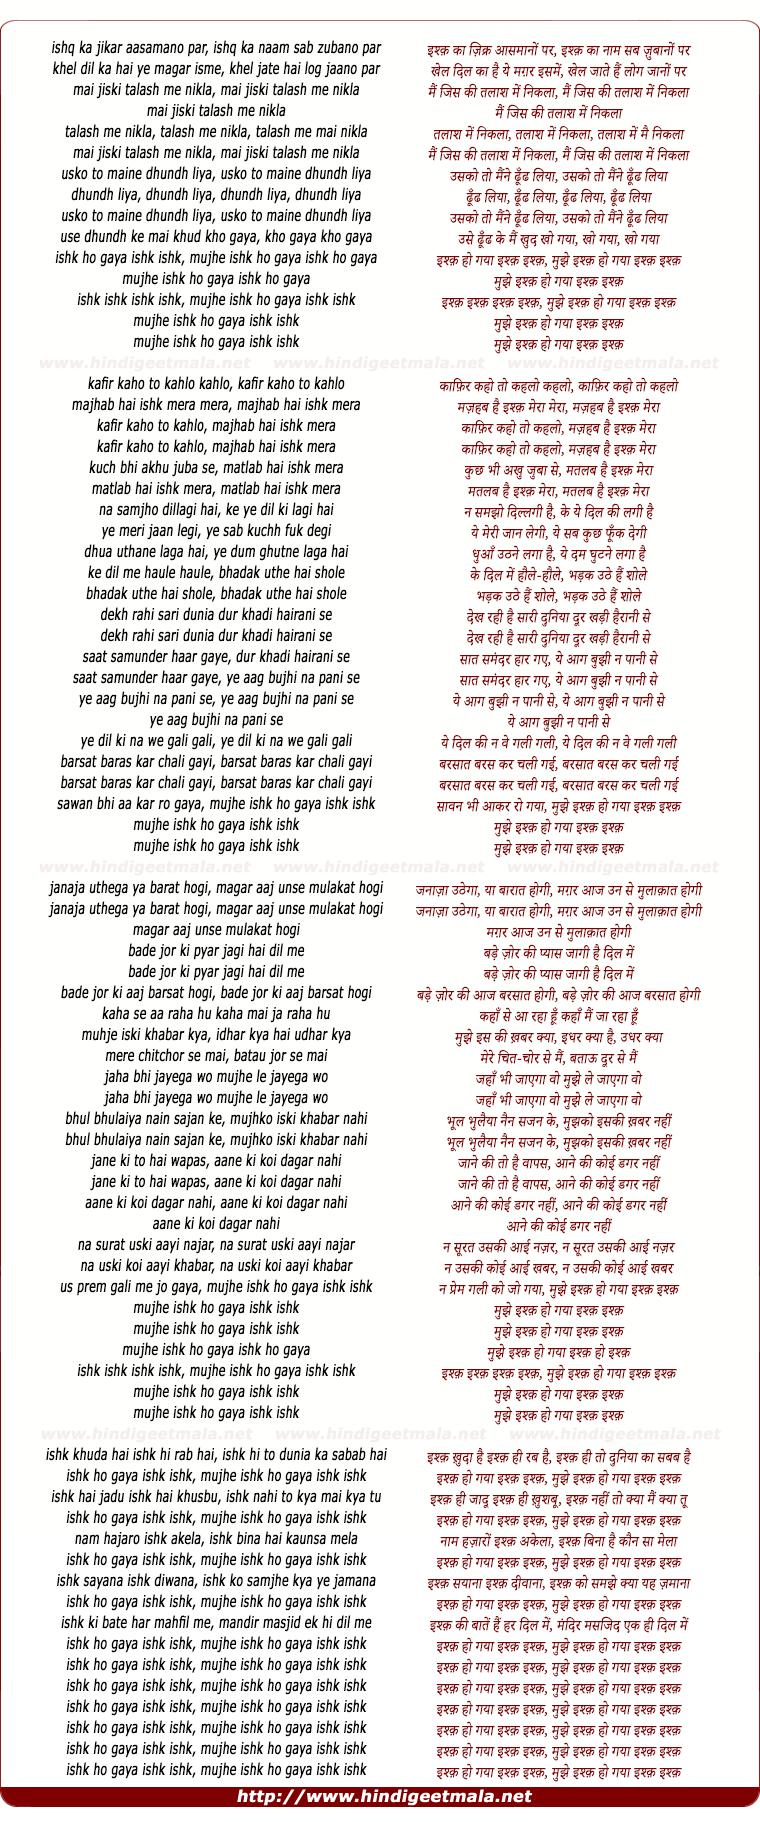 lyrics of song Mujhe Ishq Ho Gayaa, Ishq Ishq